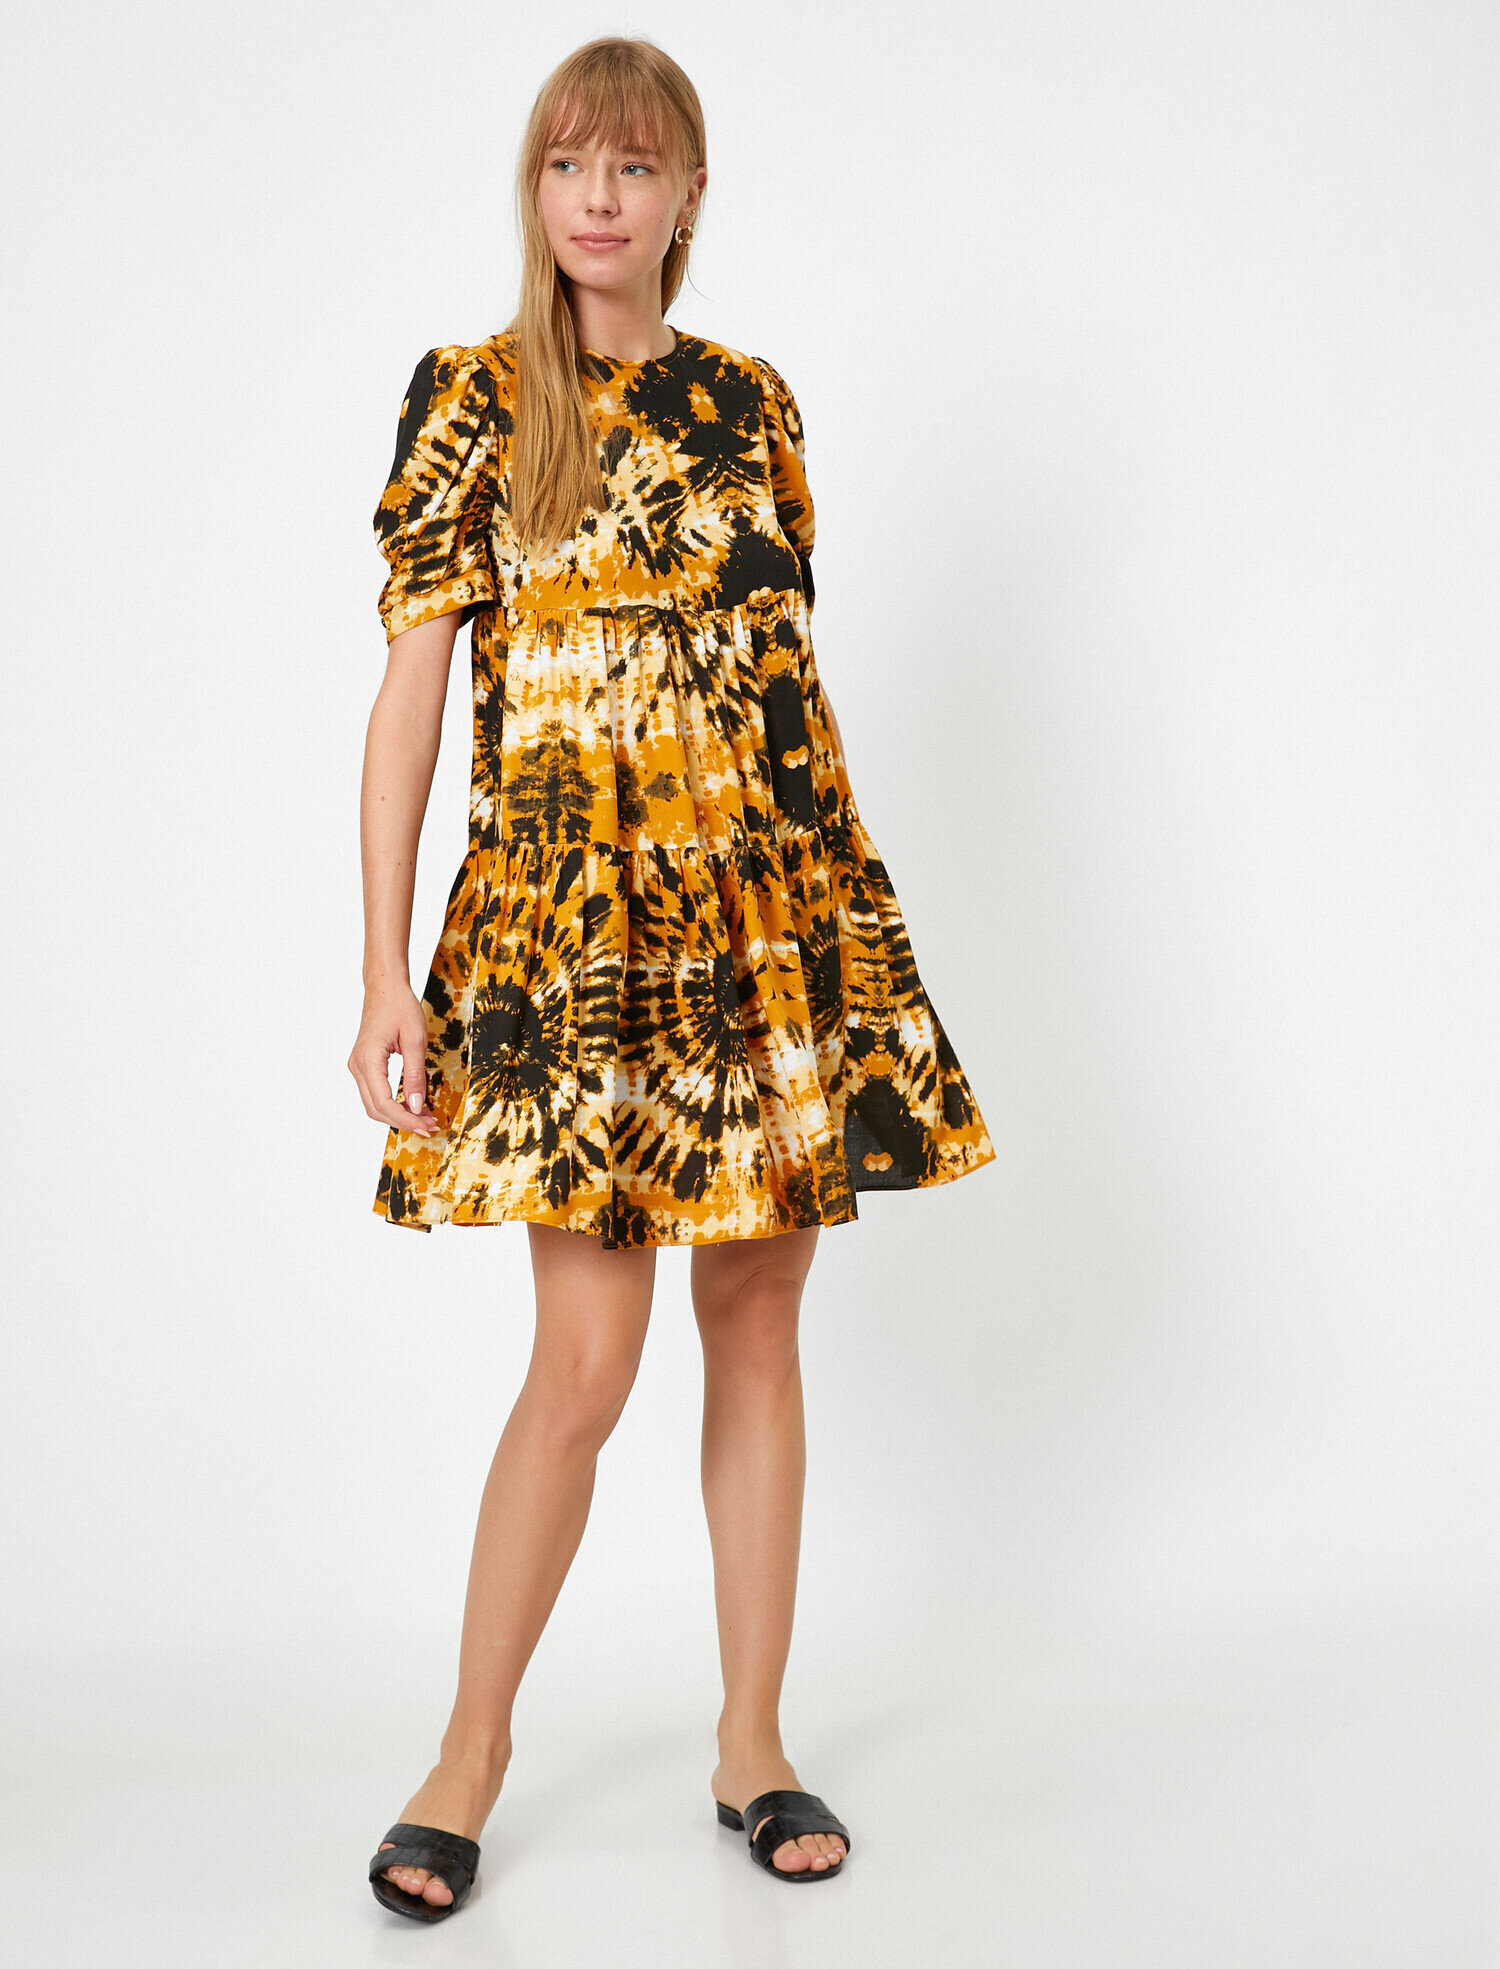 Hardal Bayan Batik Desenli Katli Elbise 0yaf80280fw02d Koton